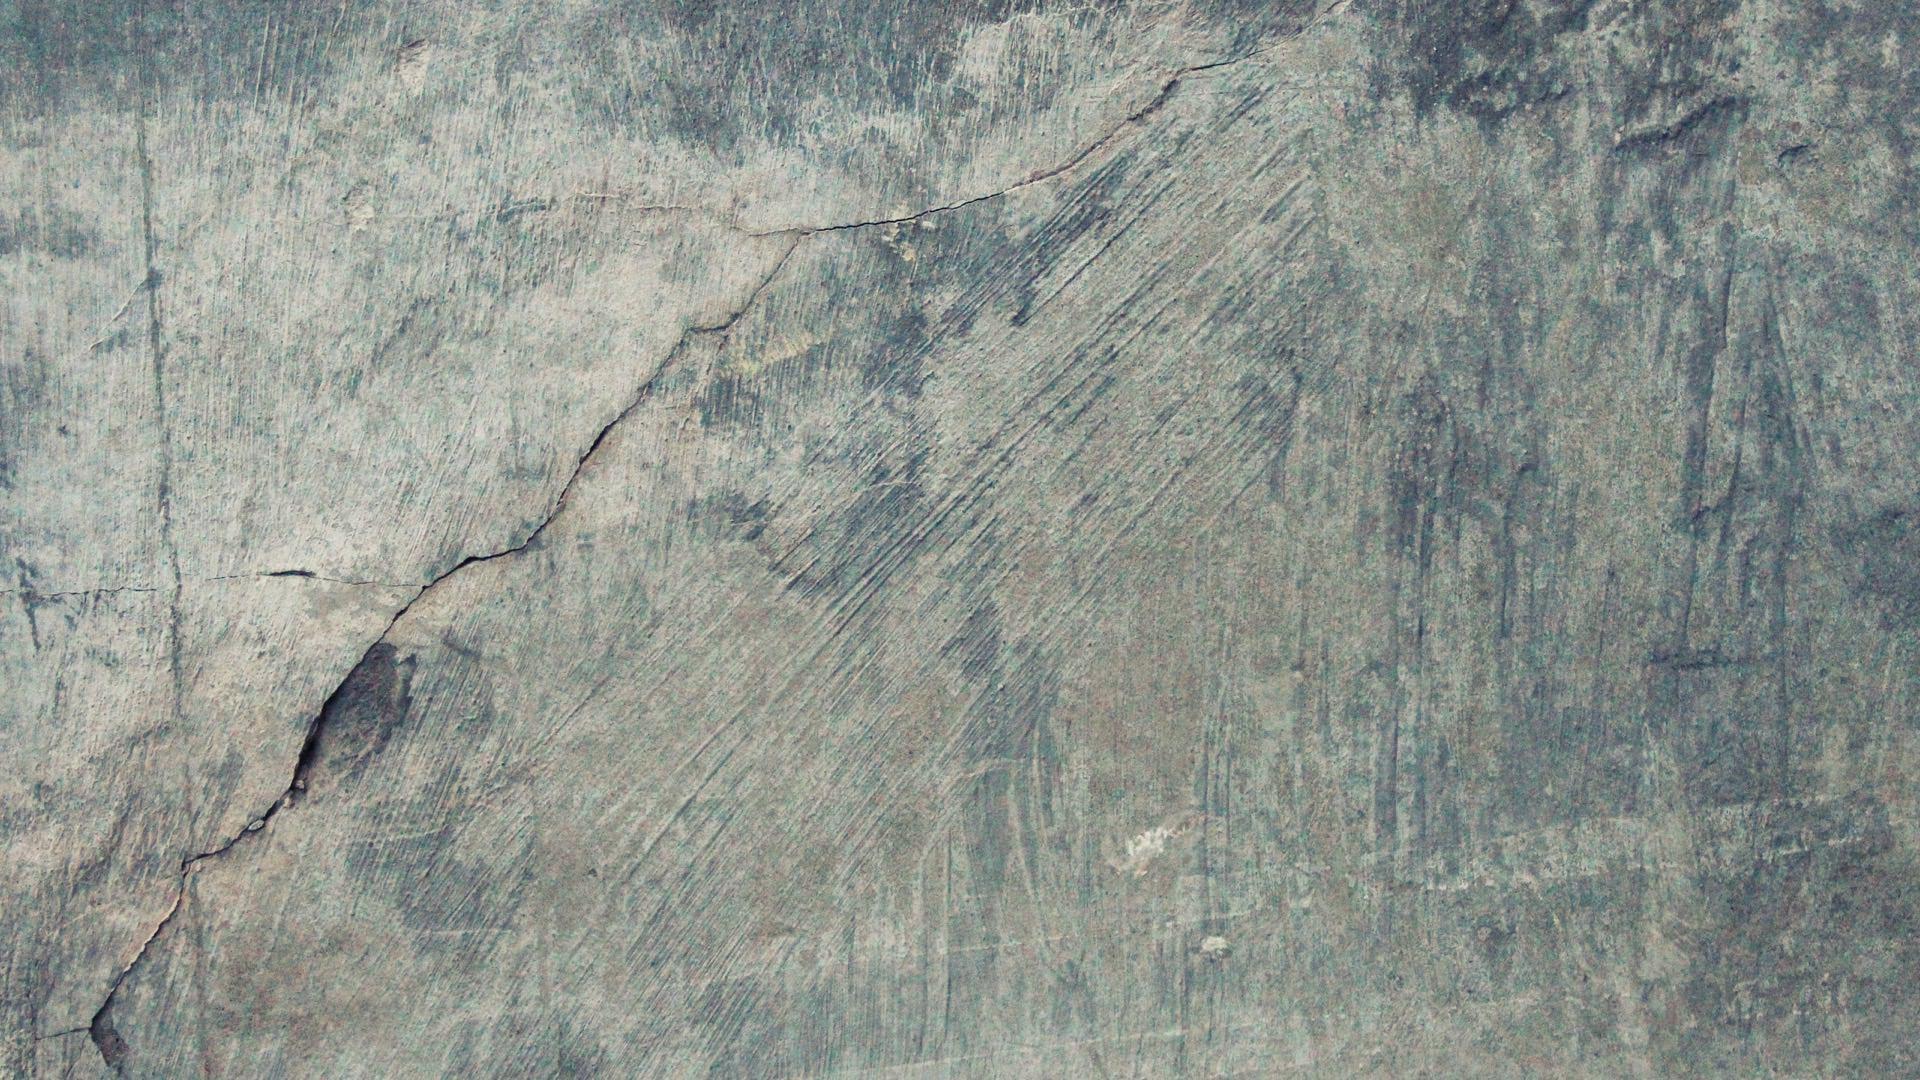 retina wallpapers reddit